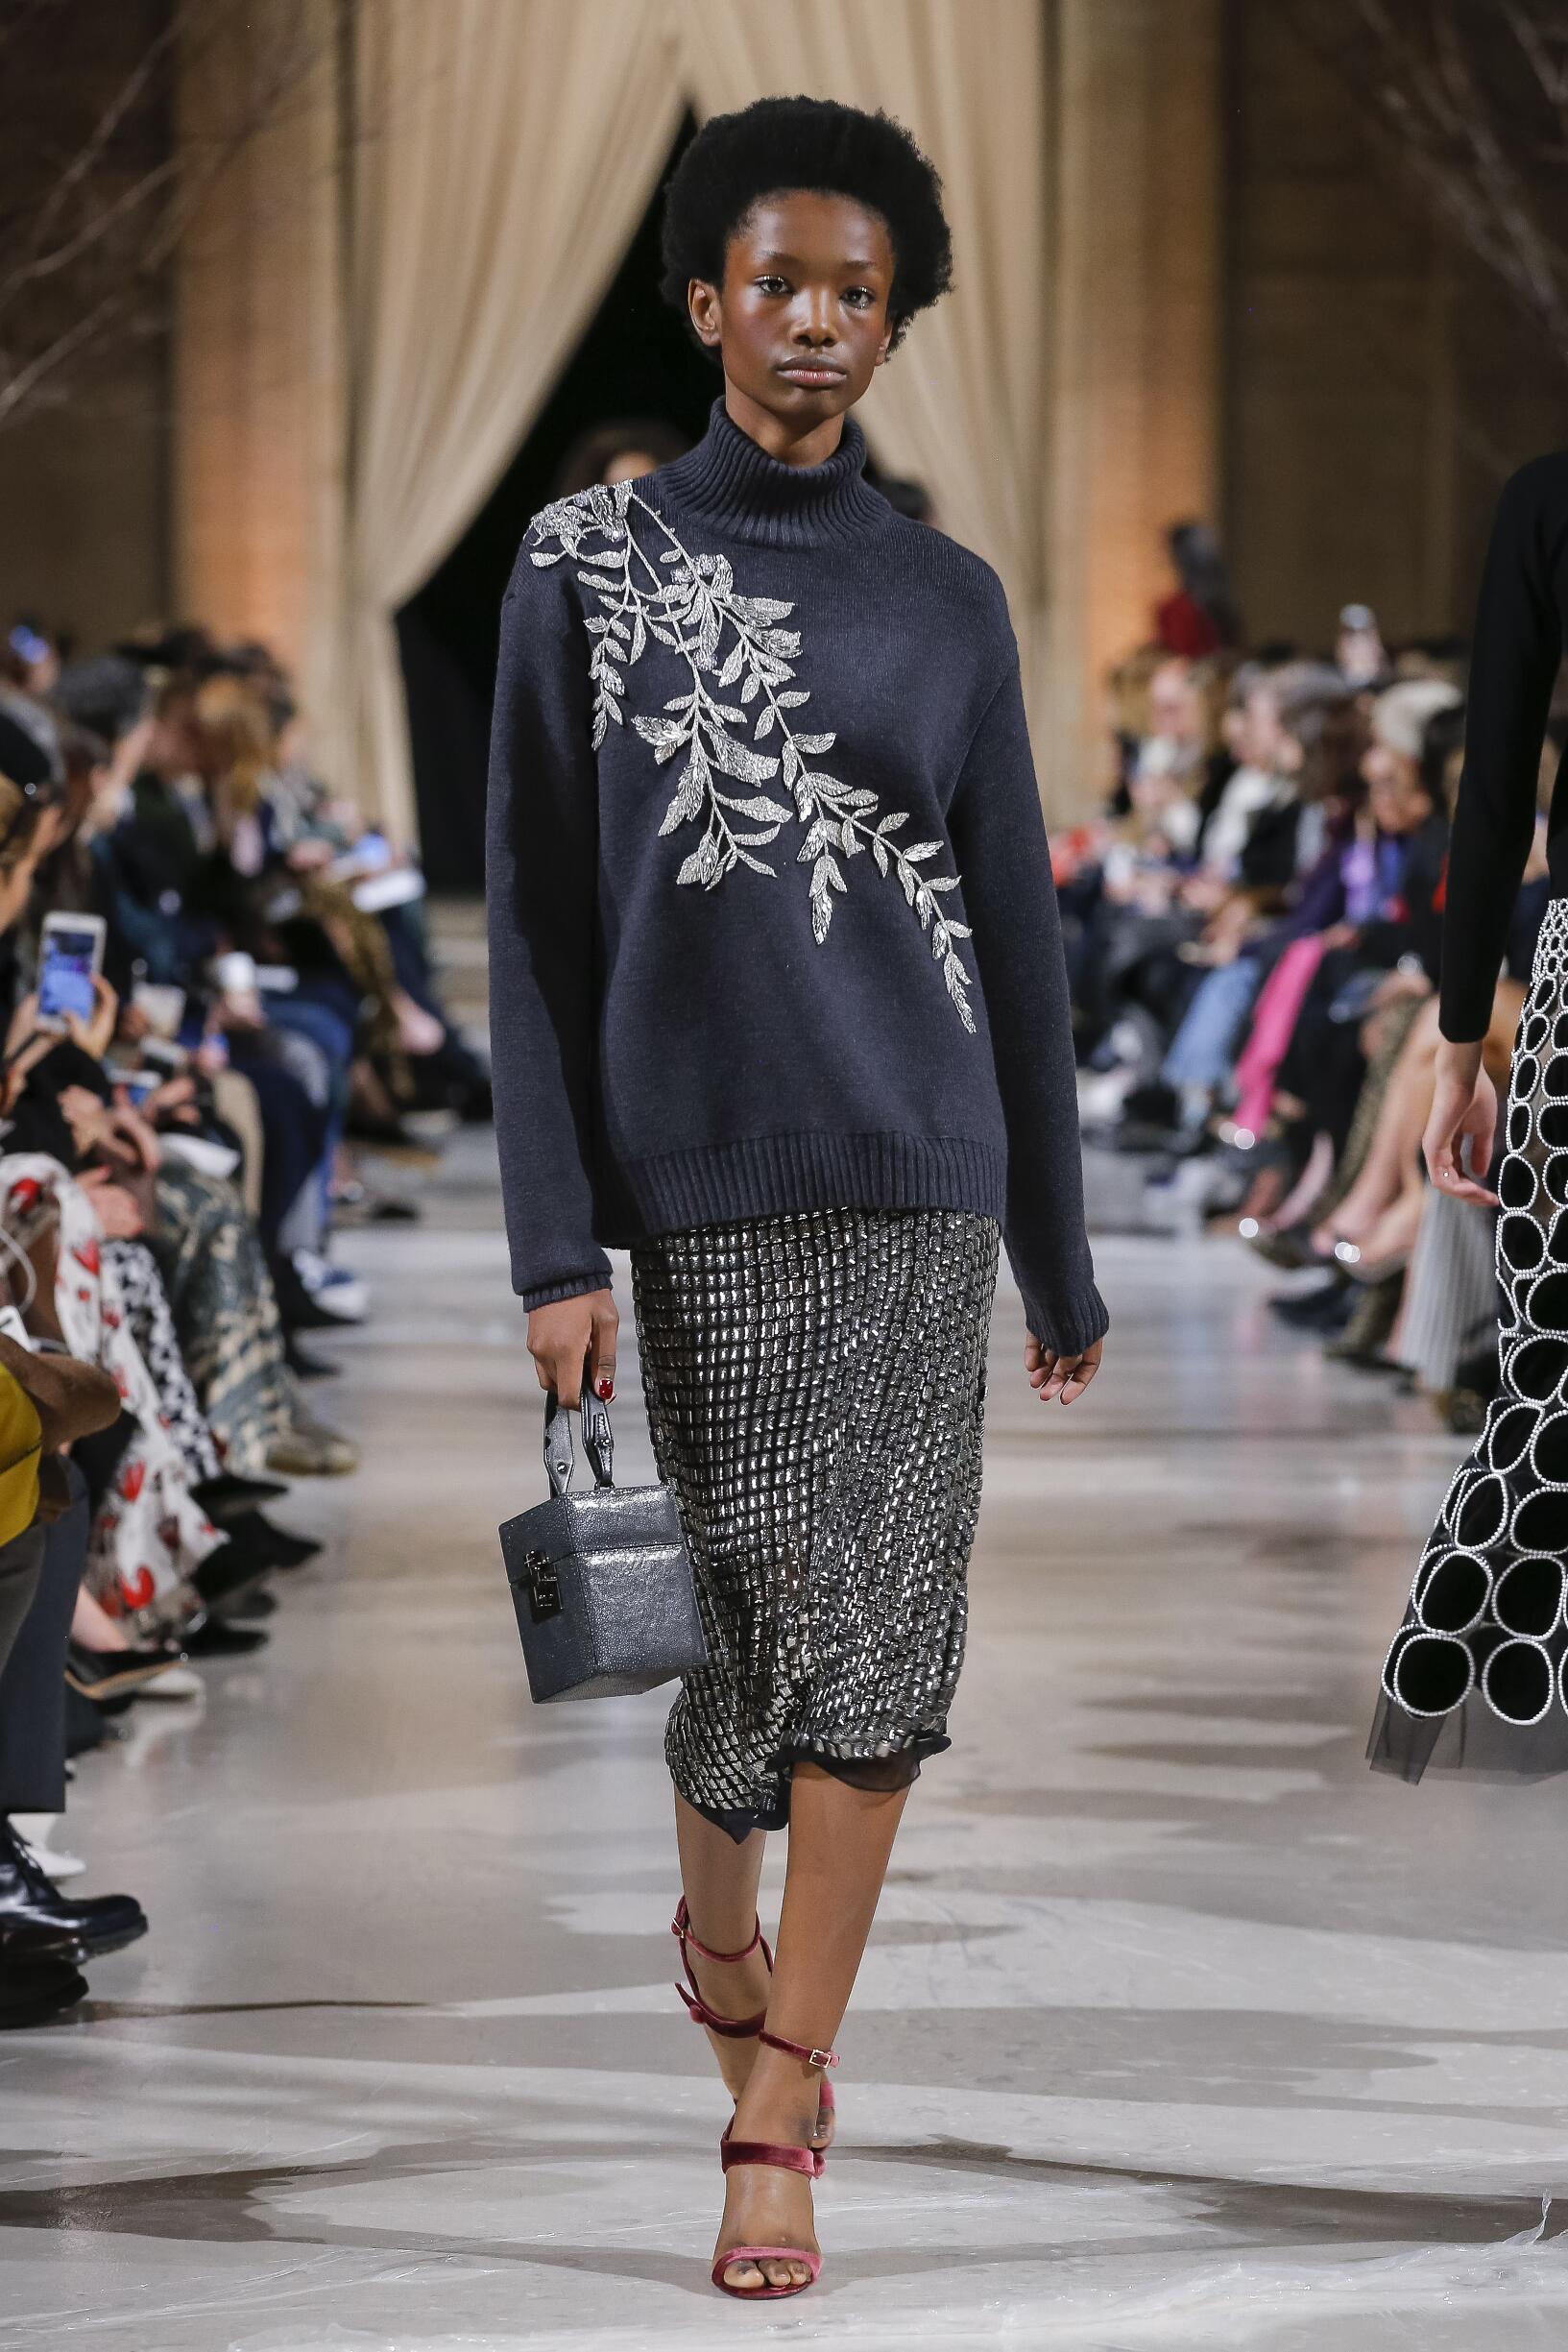 Fashion 2018-2019 Catwalk Oscar de la Renta Winter